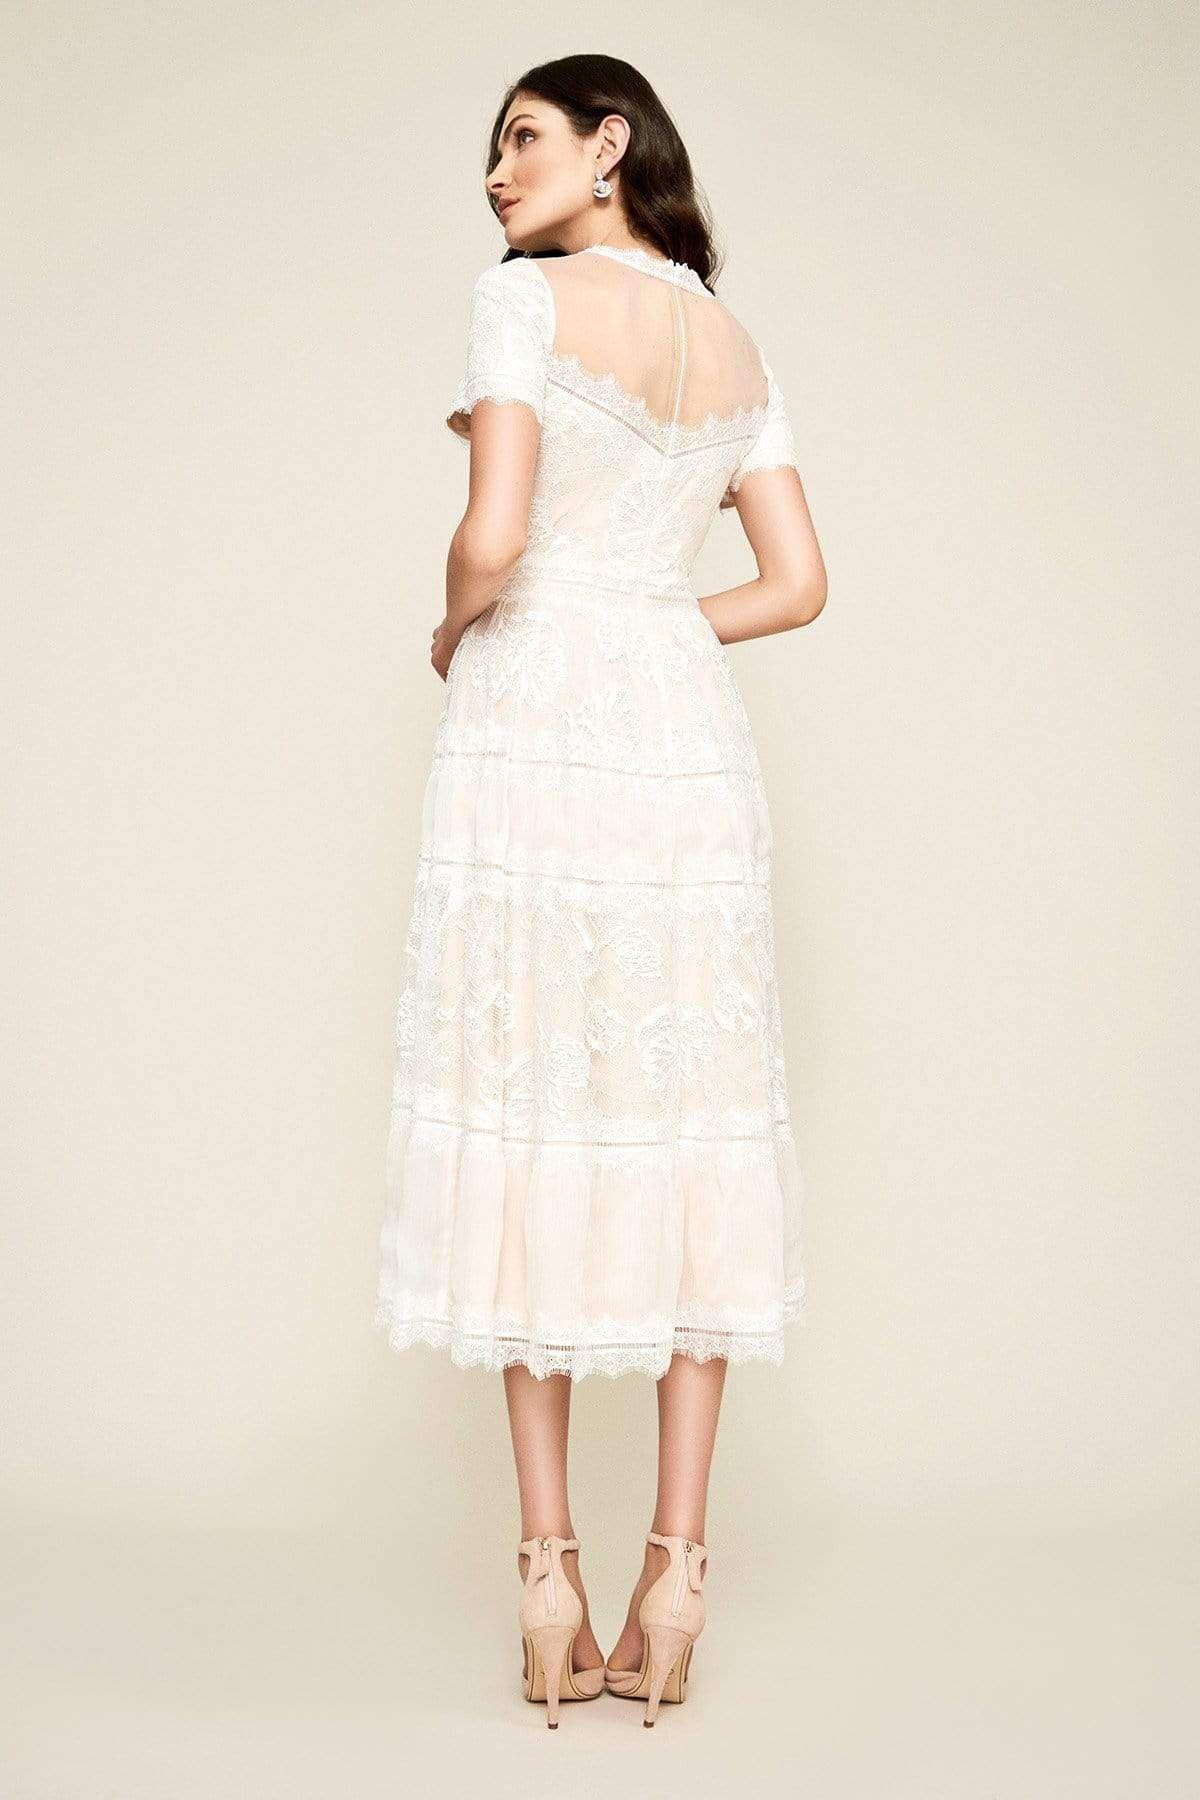 Tadashi Shoji Illusion Neckline Sheer Lace Tea Length Dress In 2021 Tea Length Wedding Dress Lace Tea Length Dress Tea Length Dresses [ 1800 x 1200 Pixel ]